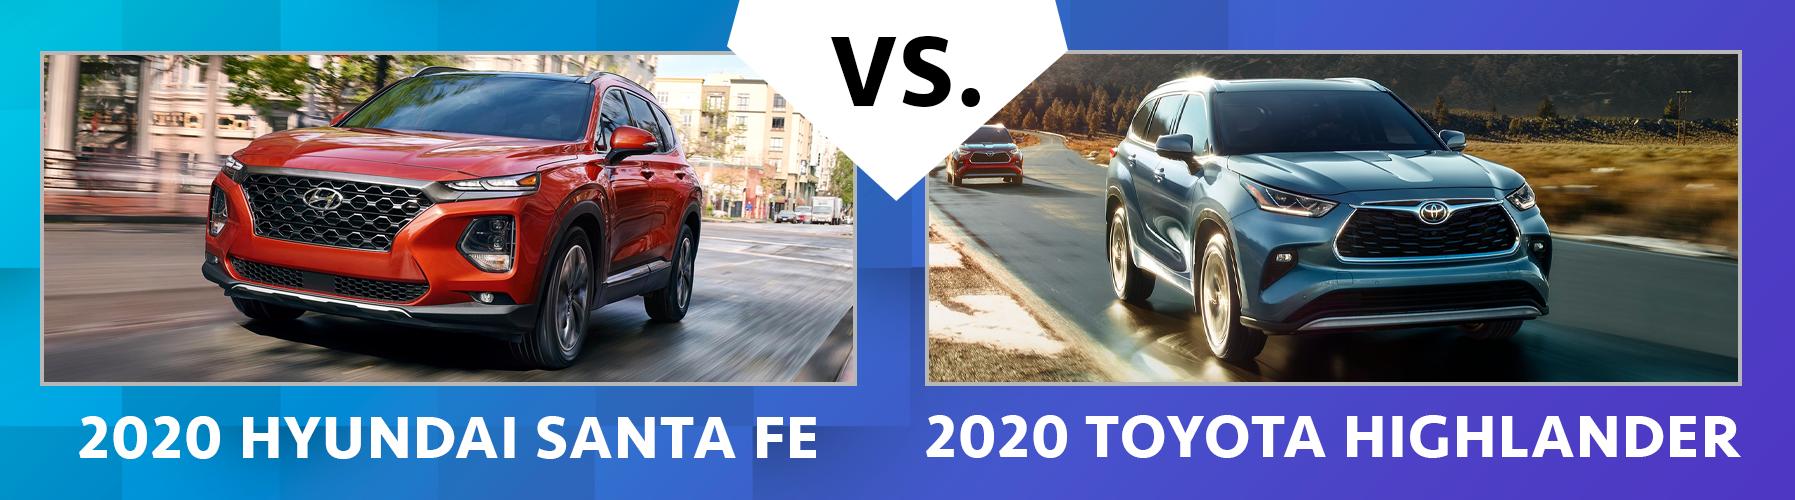 W2020 Santa Fe vs 2020 Toyota Highlander Comparisons